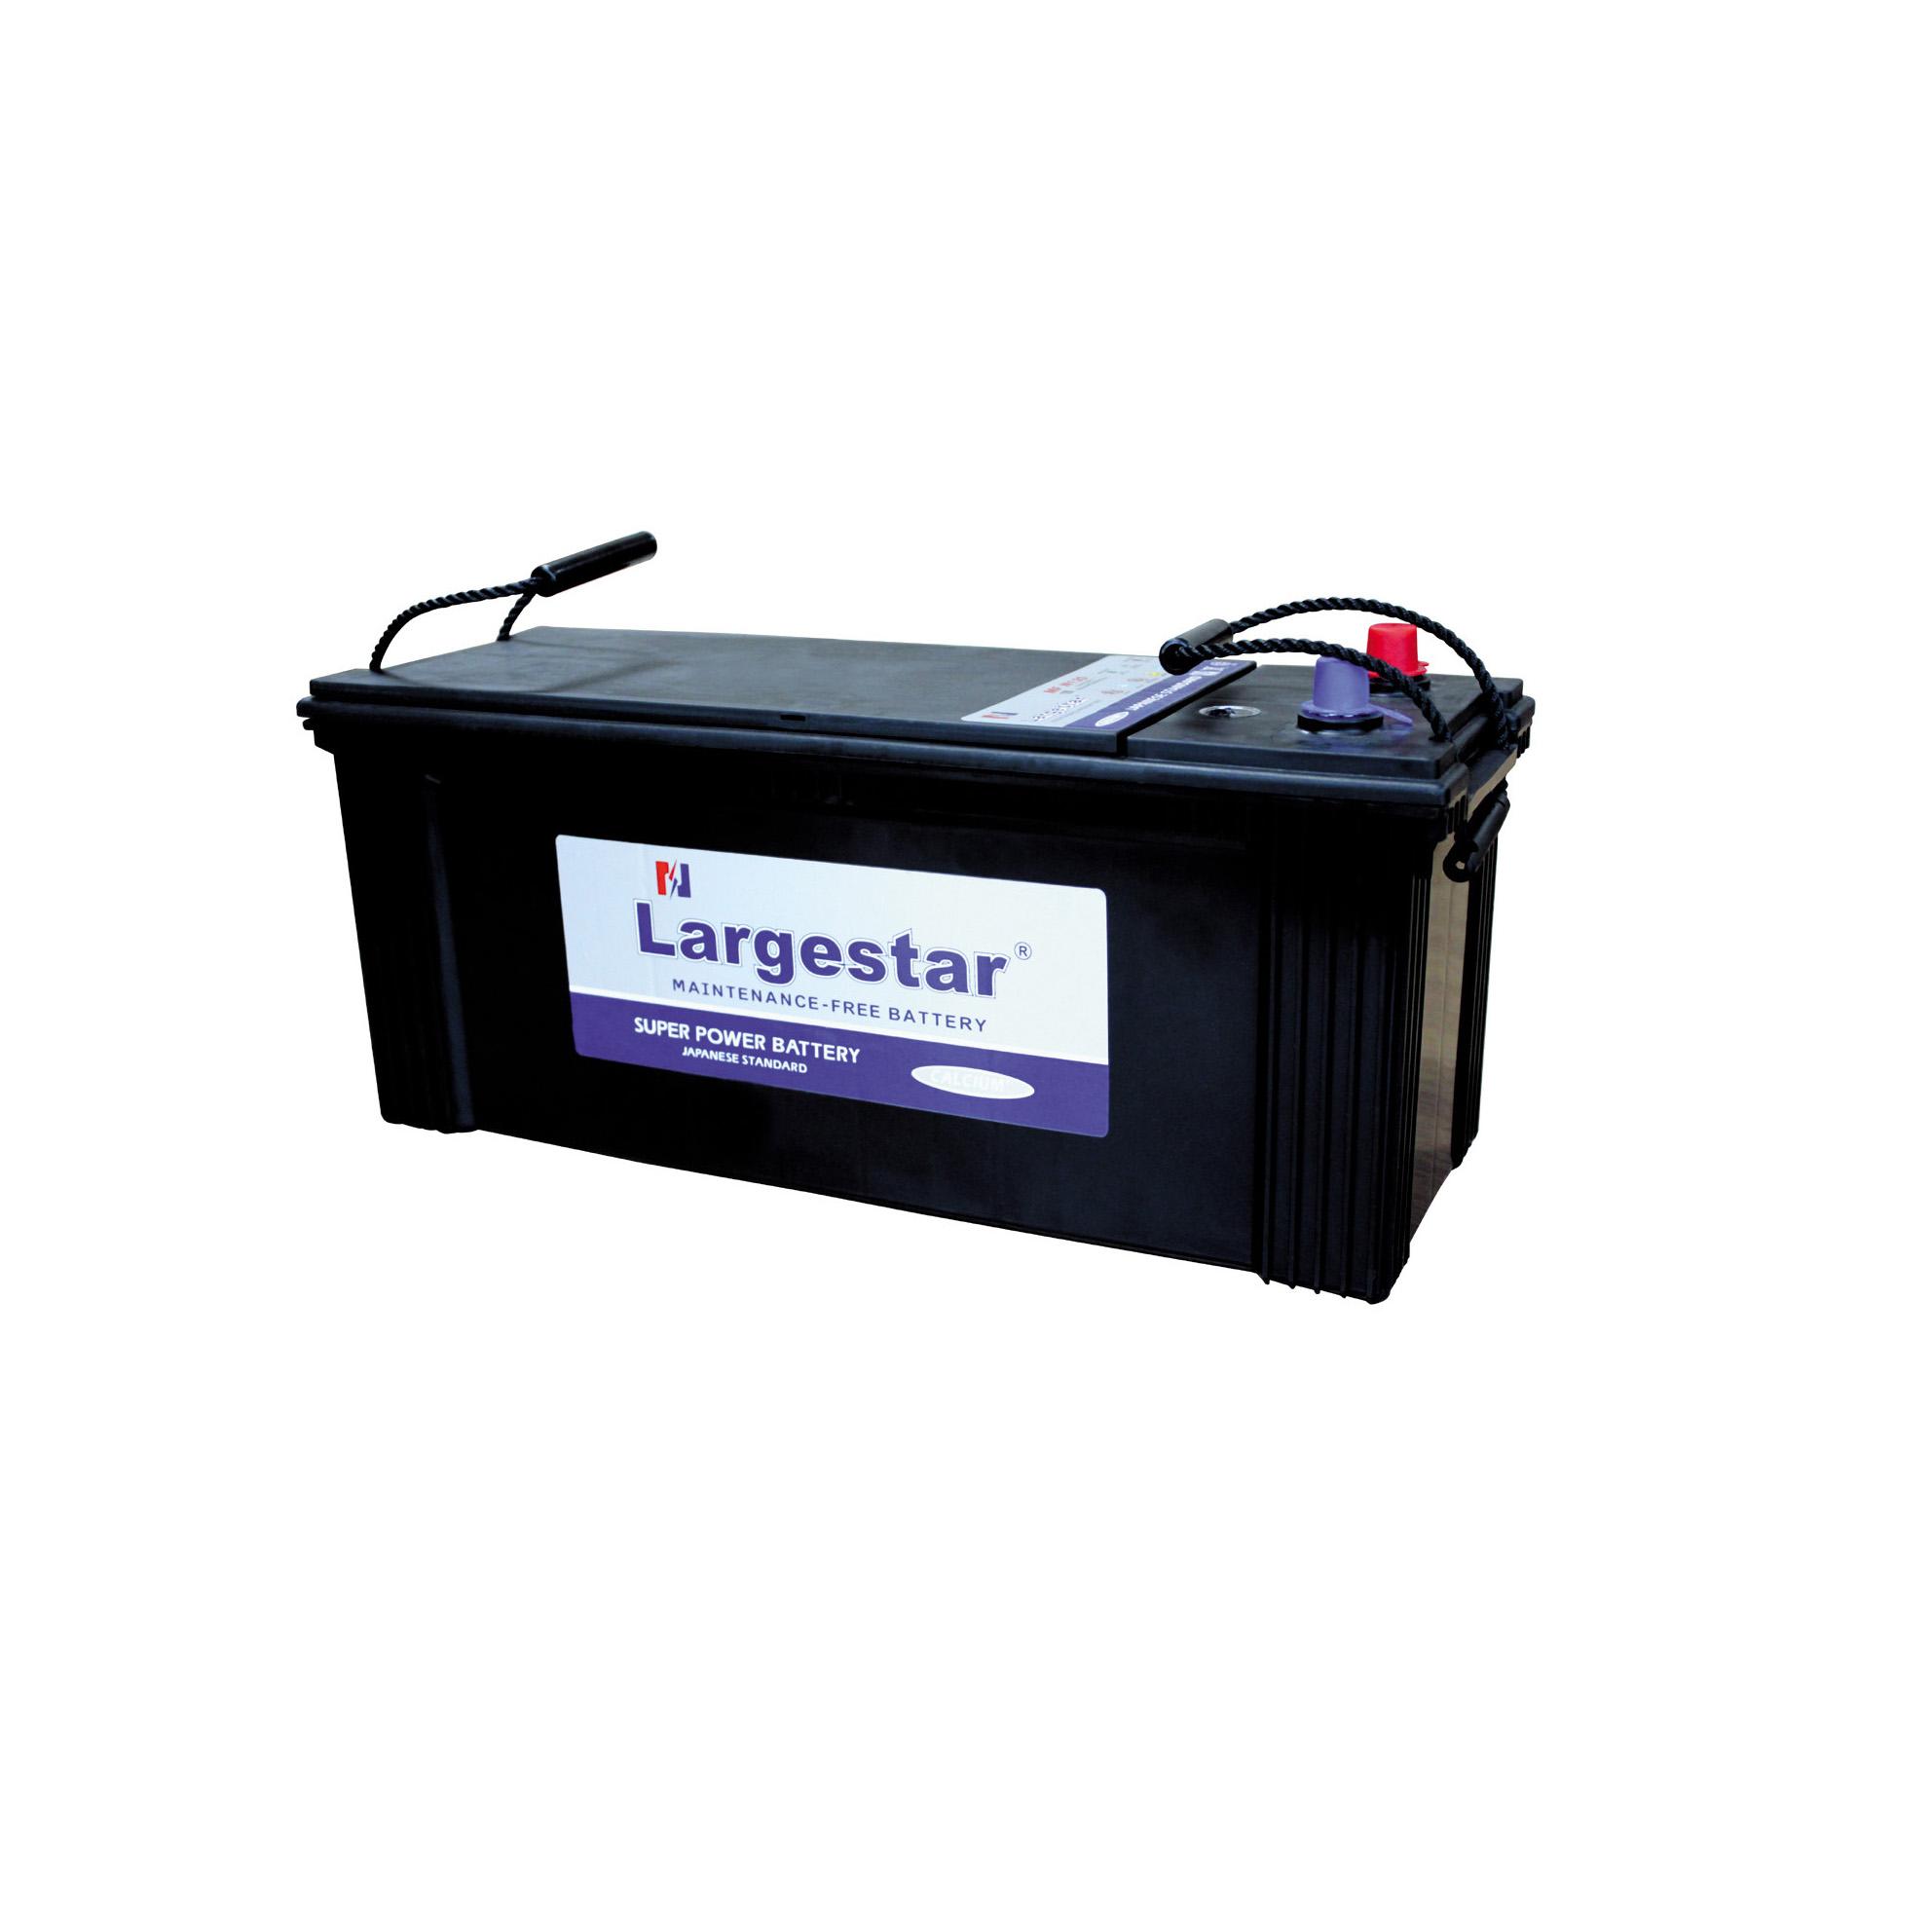 MFN120 12V120Ah Starting Battery JIS Standard Lead Acid Bus Battery Car OEM